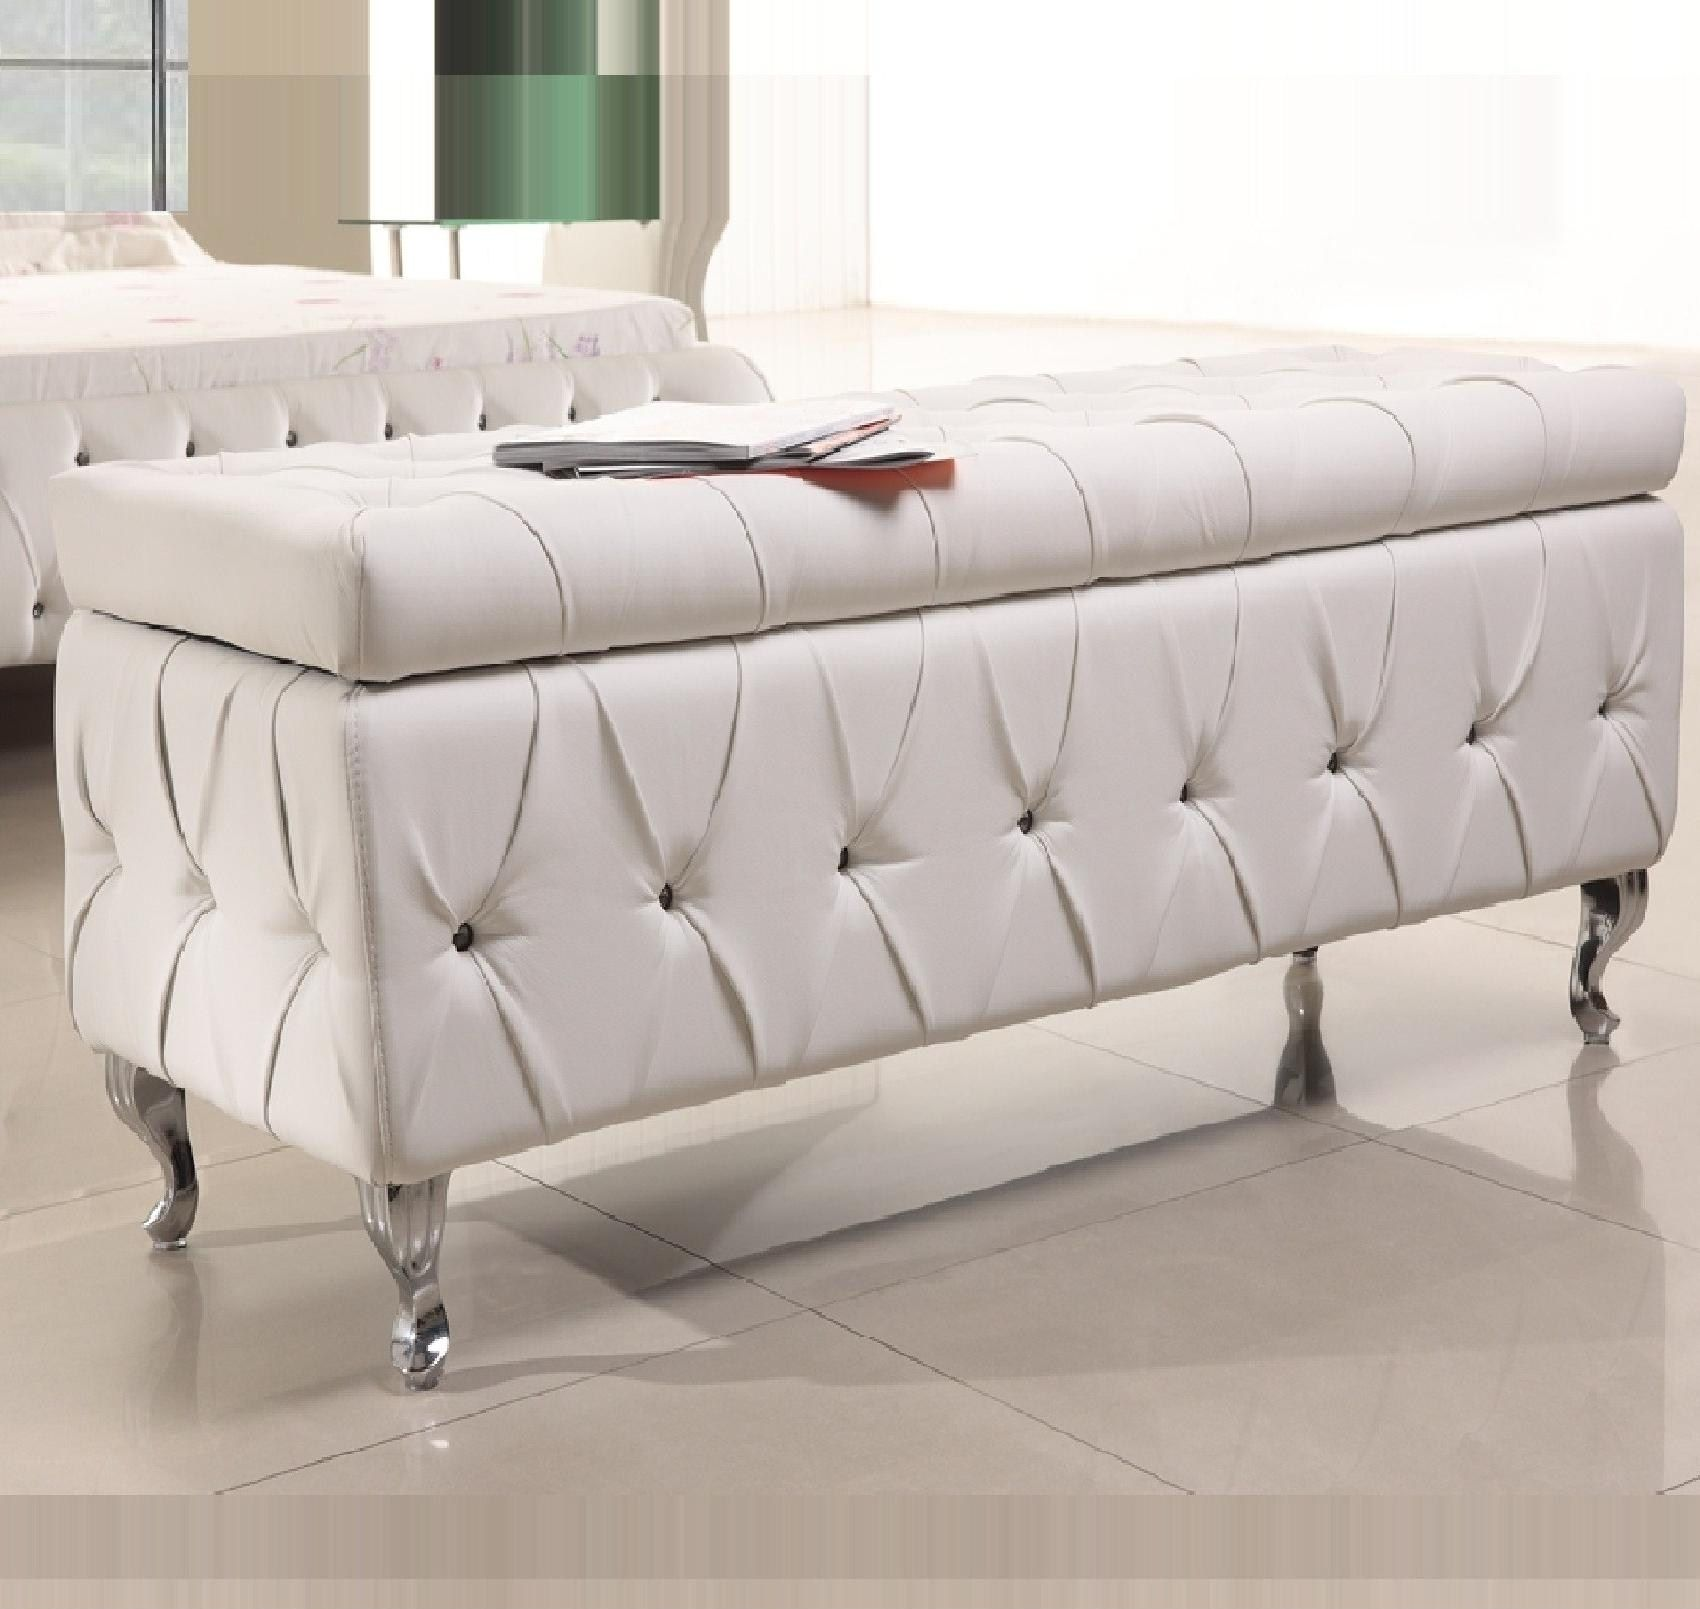 Cassapanca ikea bianca design inspiration - Panca camera da letto ikea ...